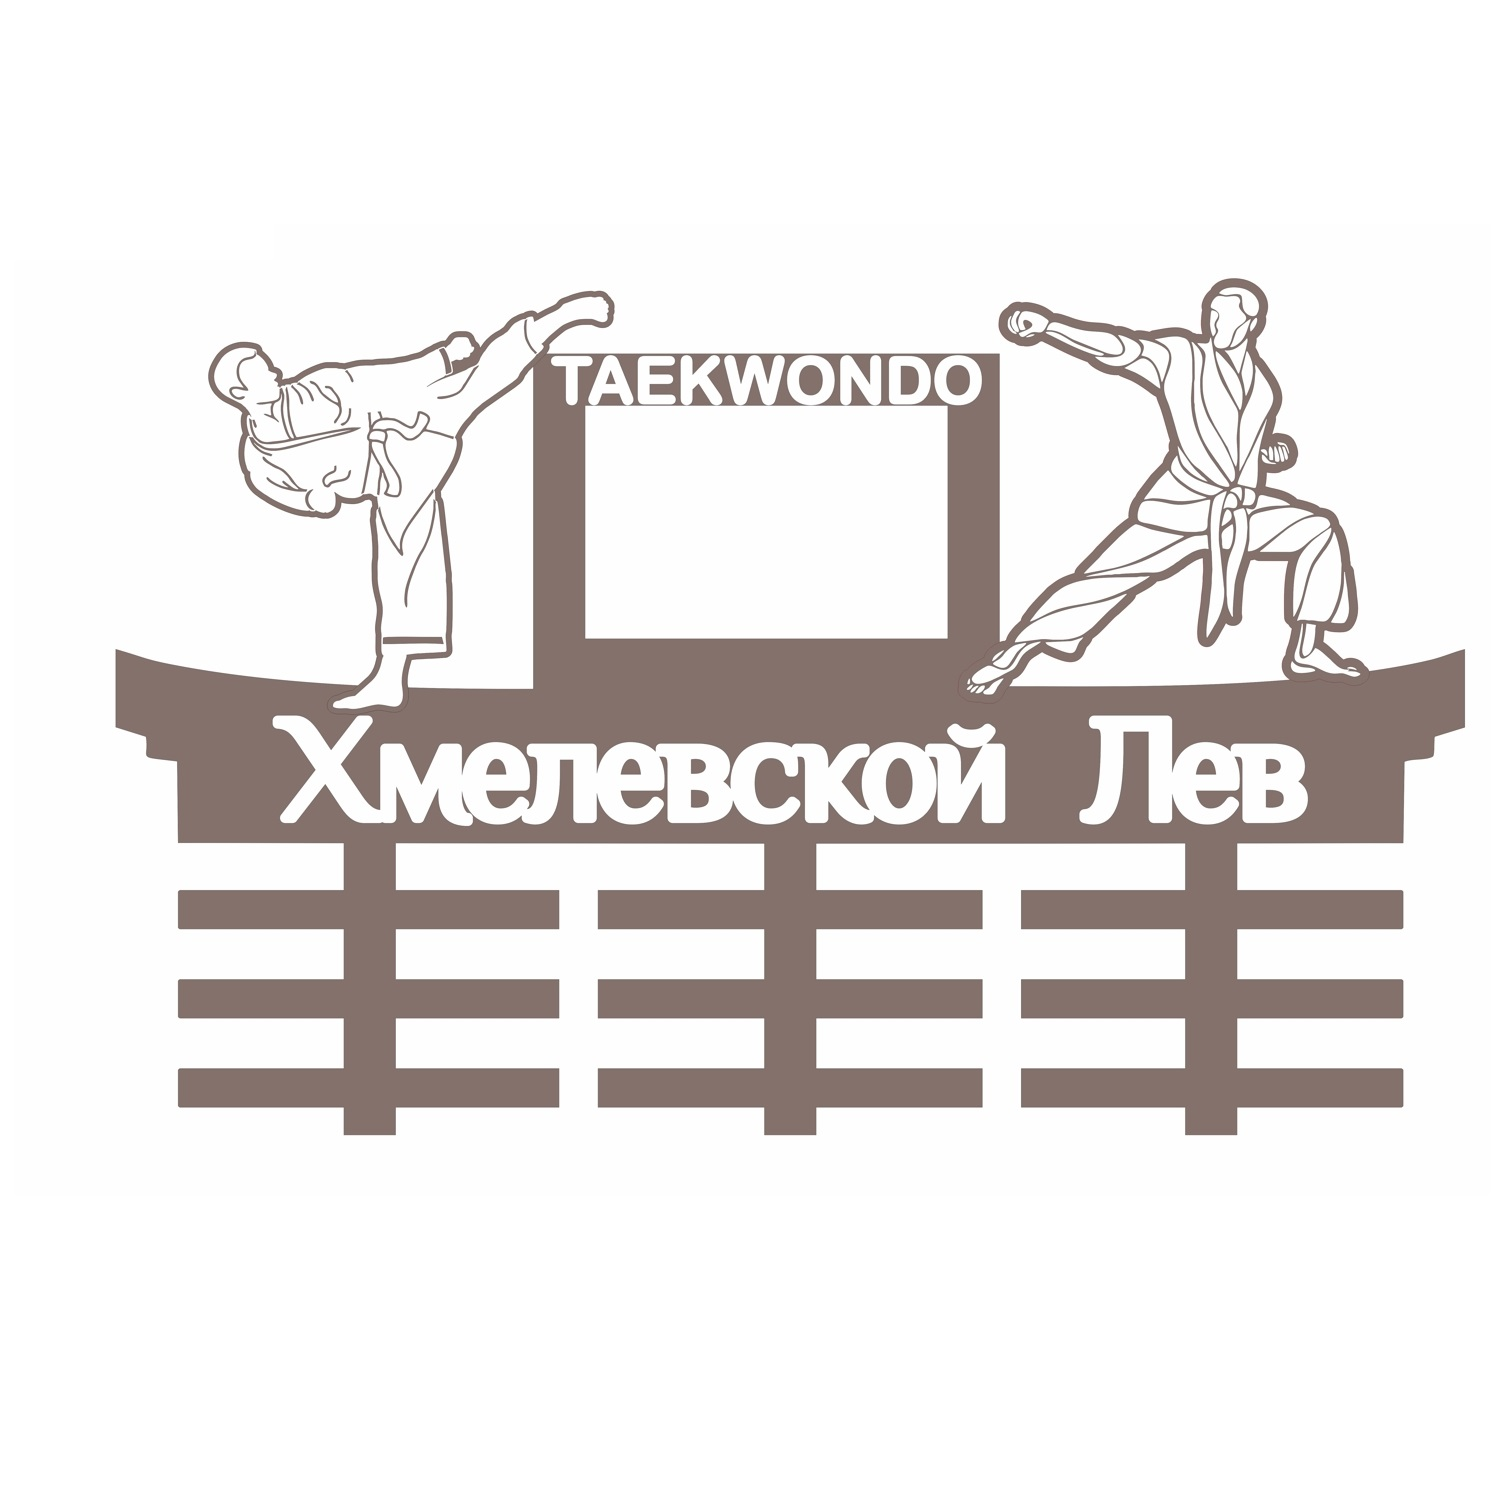 Laser Cut Taekwondo Medal Holder Martial Arts Medal Display Free Vector